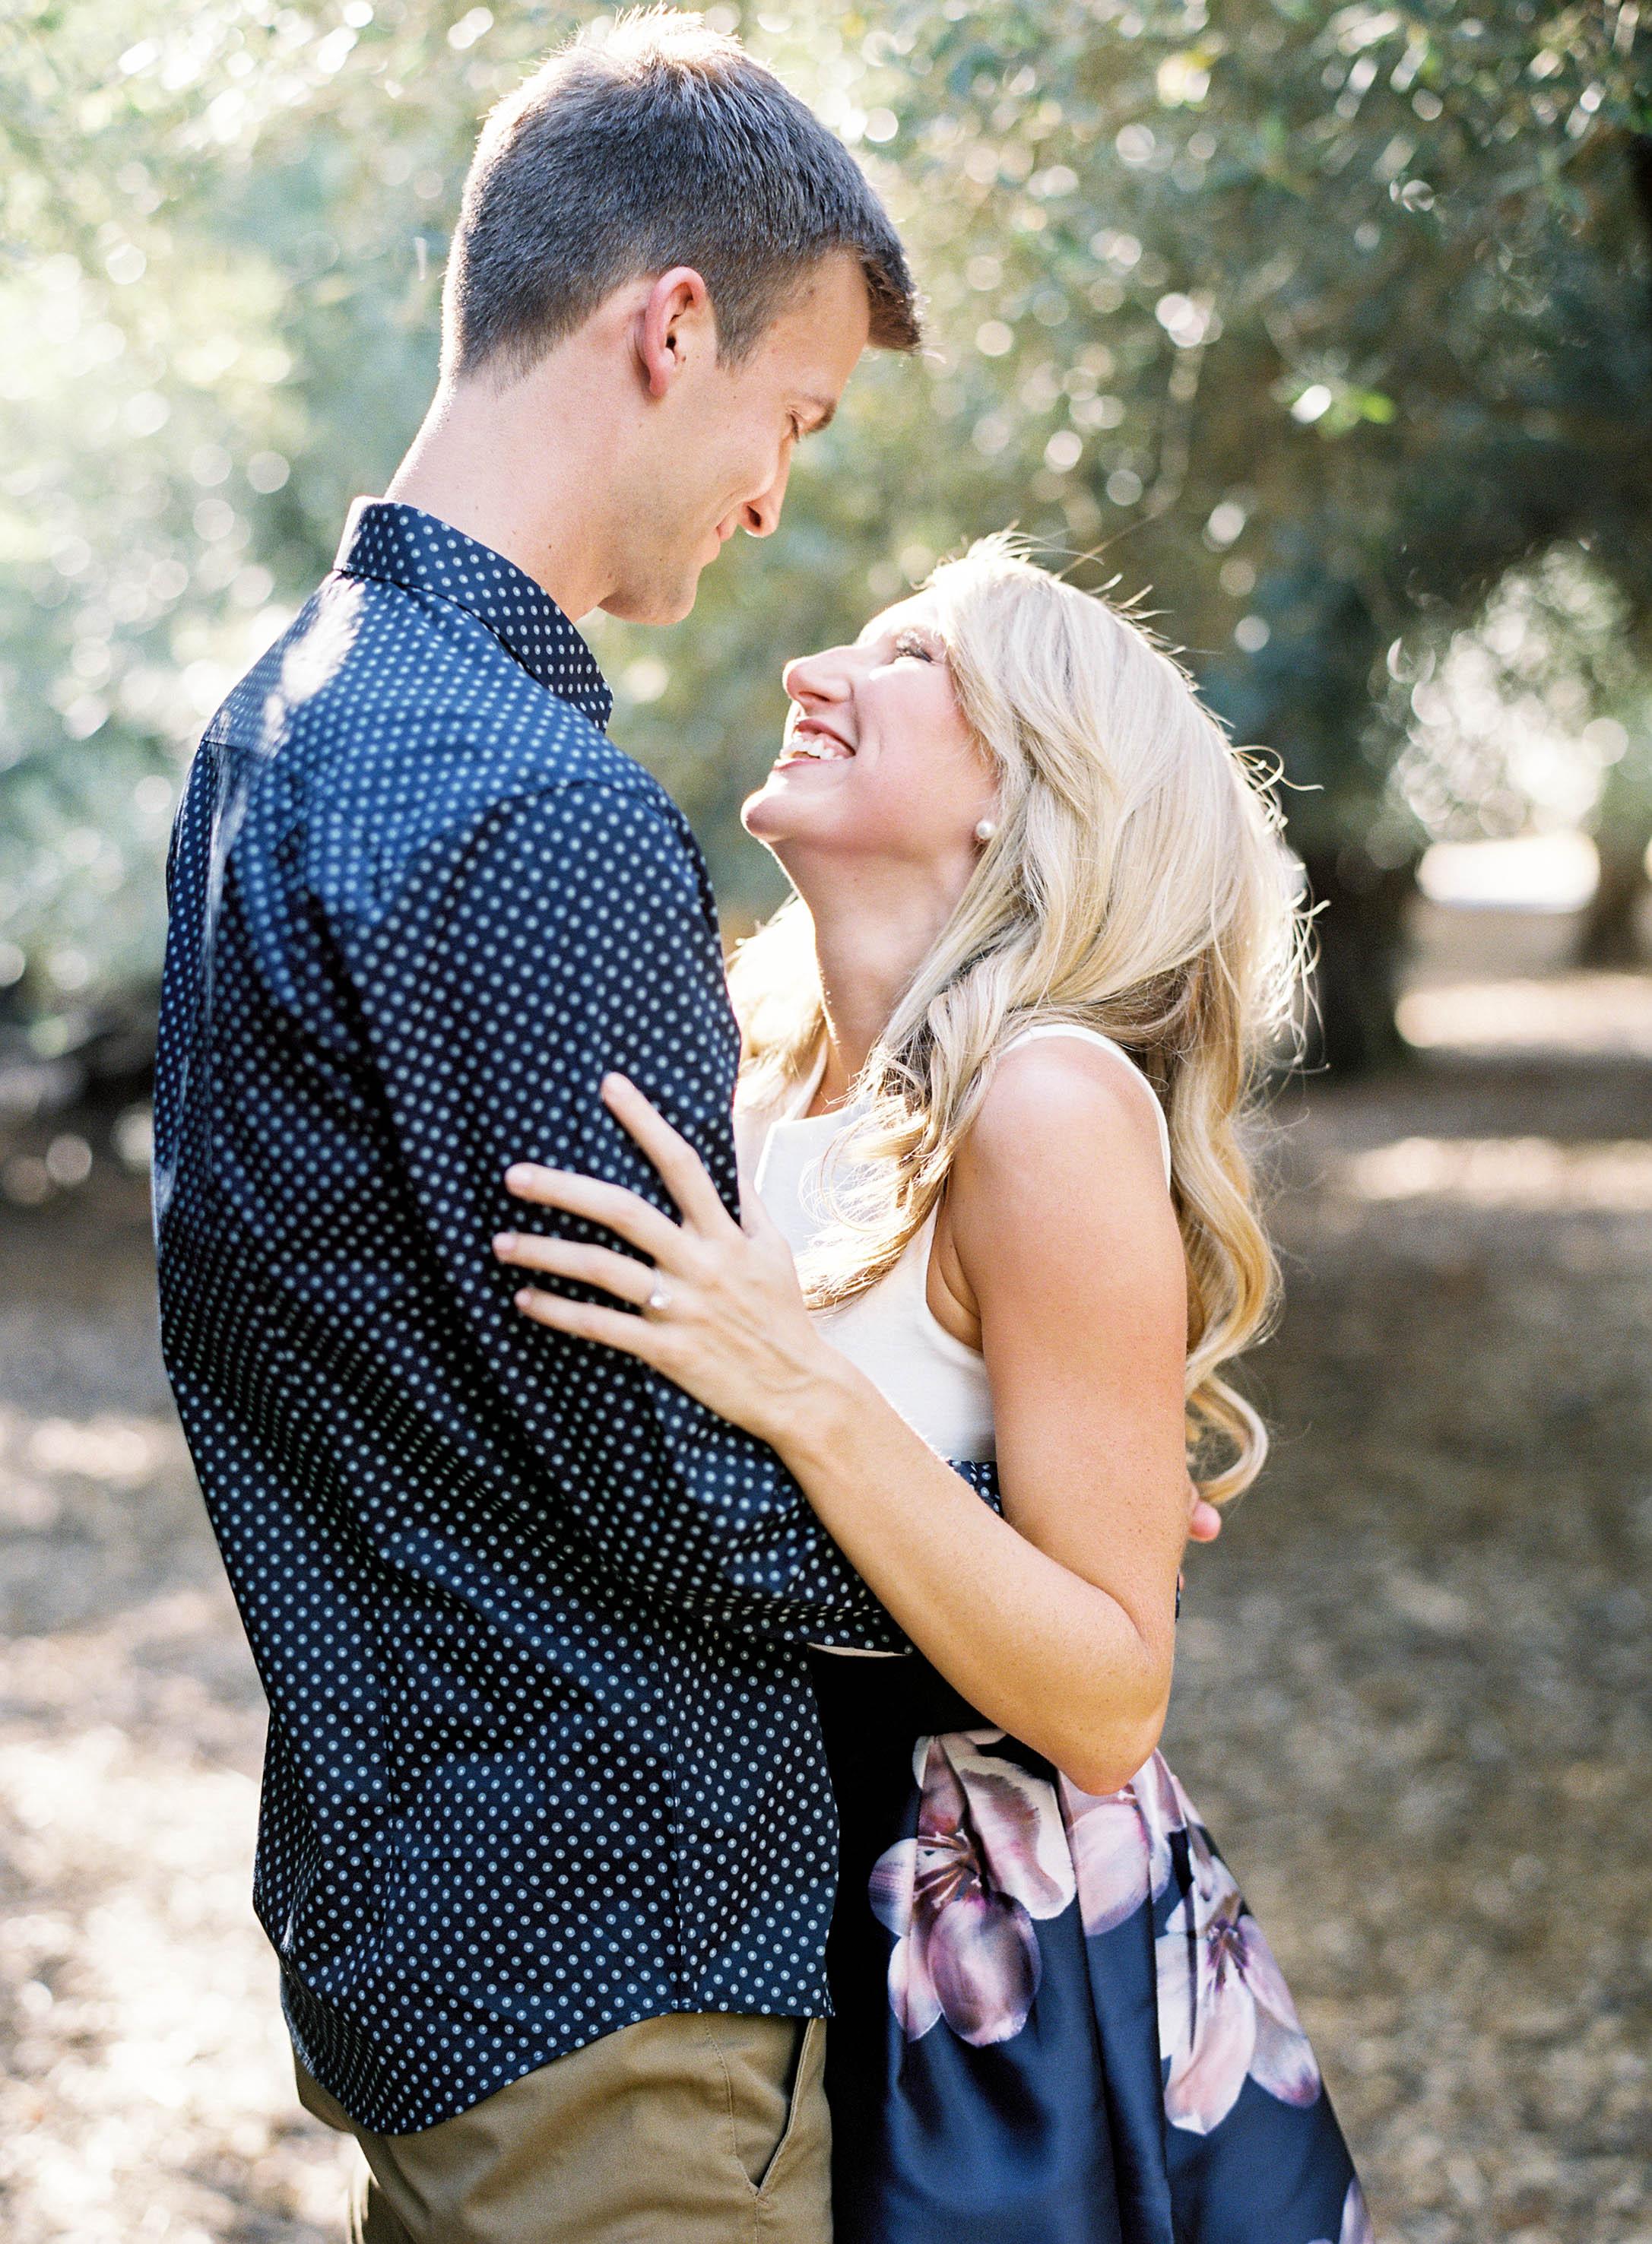 Meghan Mehan Photography - Fine Art Film Wedding Photography - San Francisco   Napa   Sonoma   Big Sur   Chicago   Minneapolis   Milwaukee   Lake Geneva   Door County   Wisconsin 024.jpg